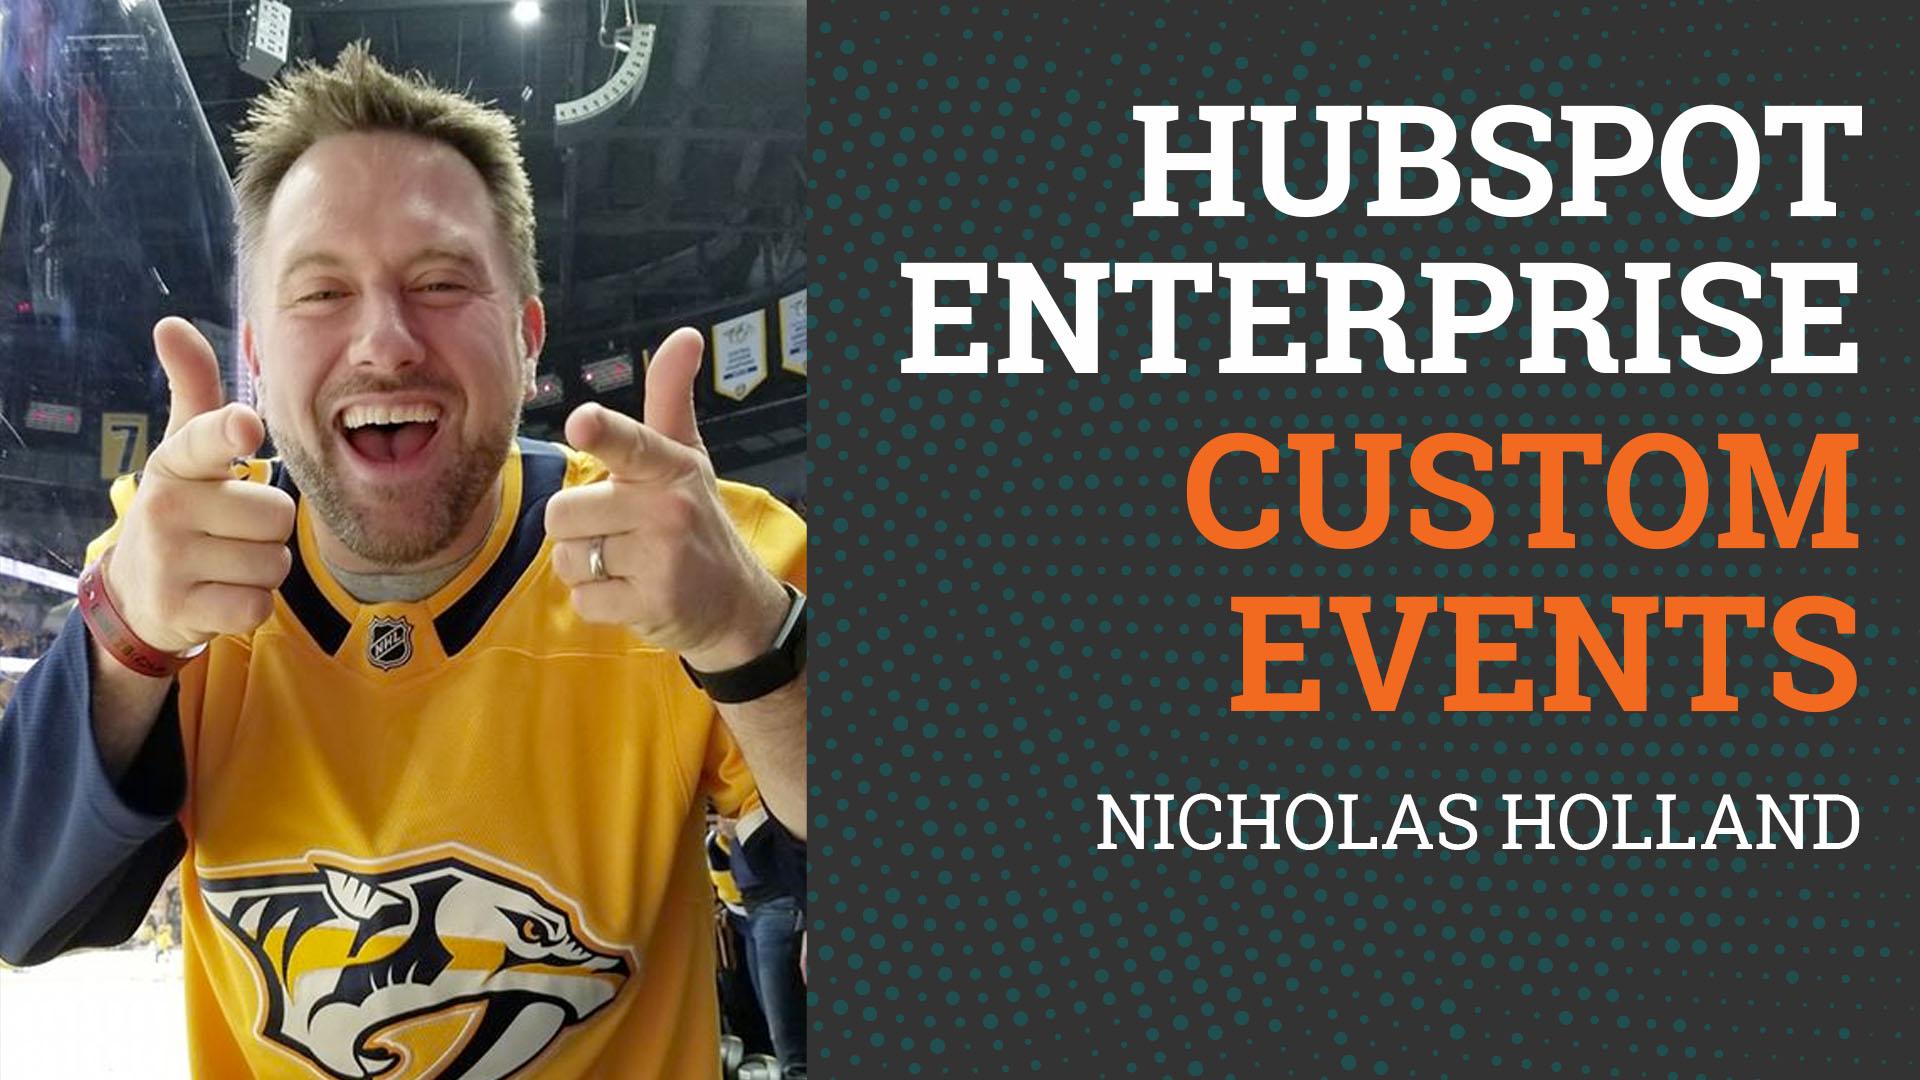 HubSpot Enterprise Custom Events • Nicholas Holland